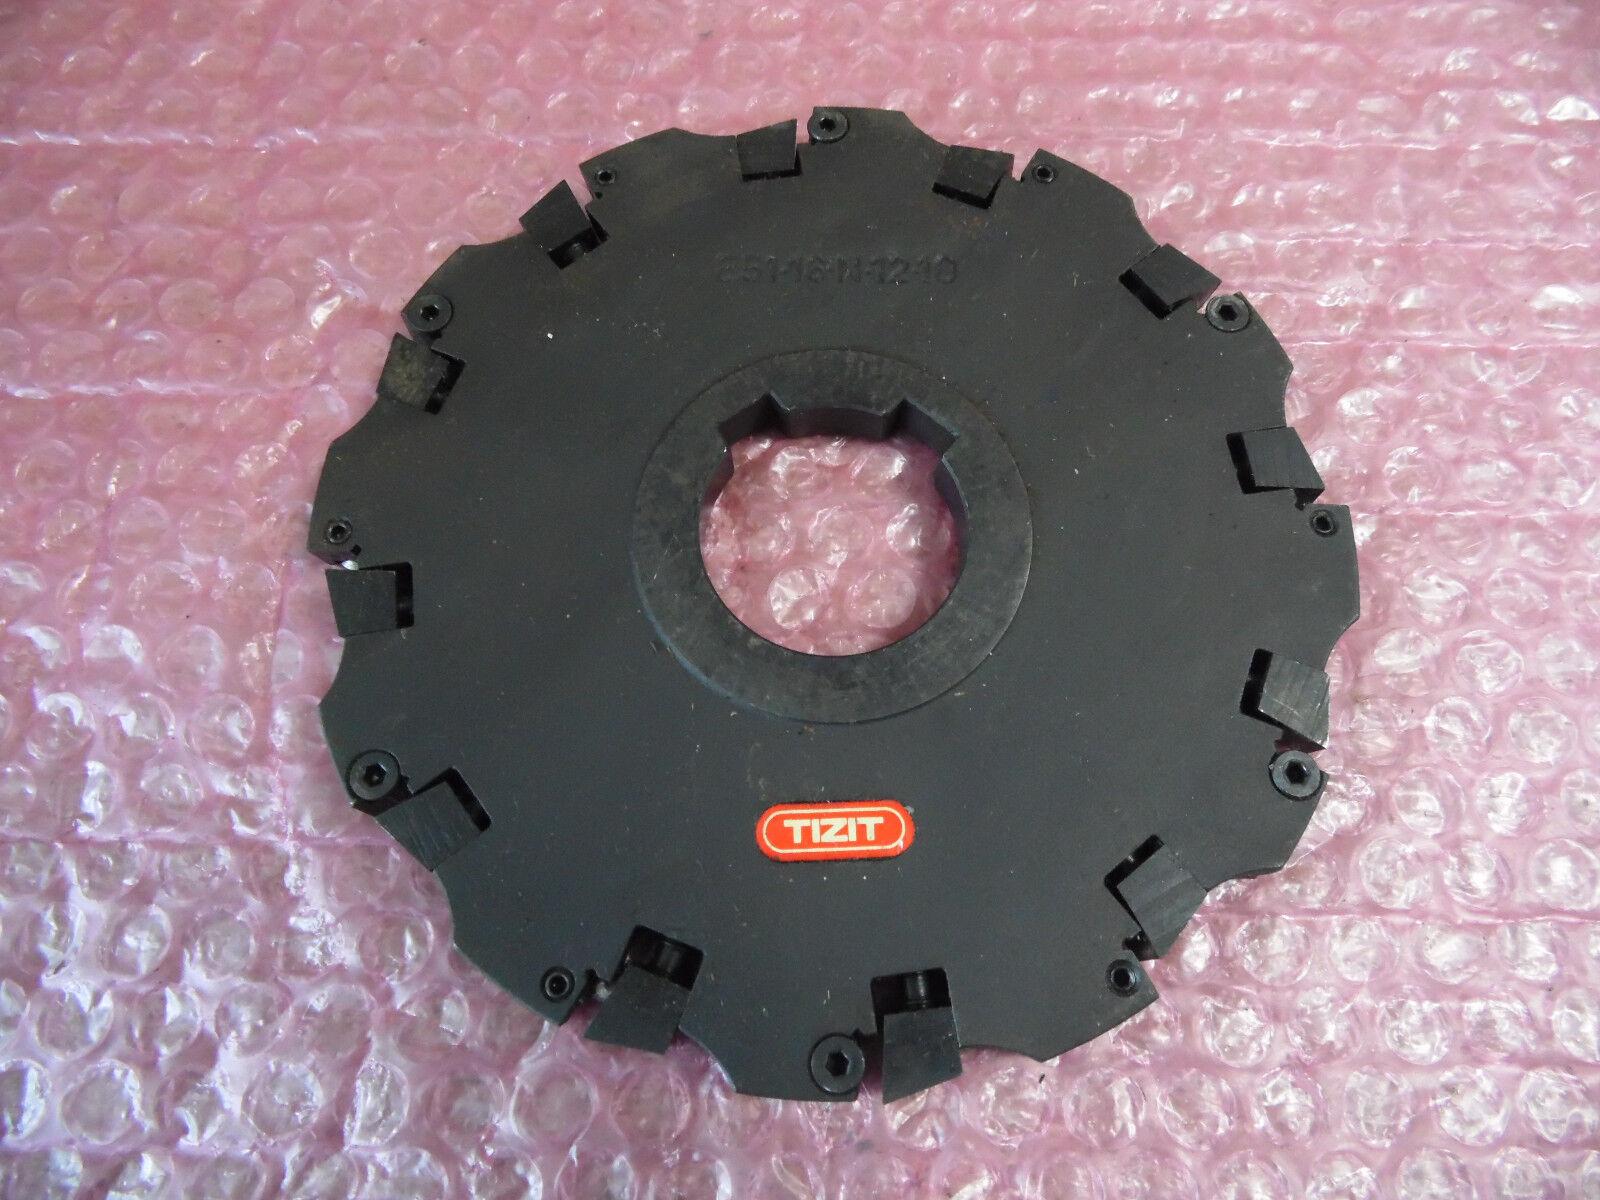 TIZIT Plansee E51-16-M-12-10 Scheibenfräser, Bohrung 40mm, D 158mm unbenutzt